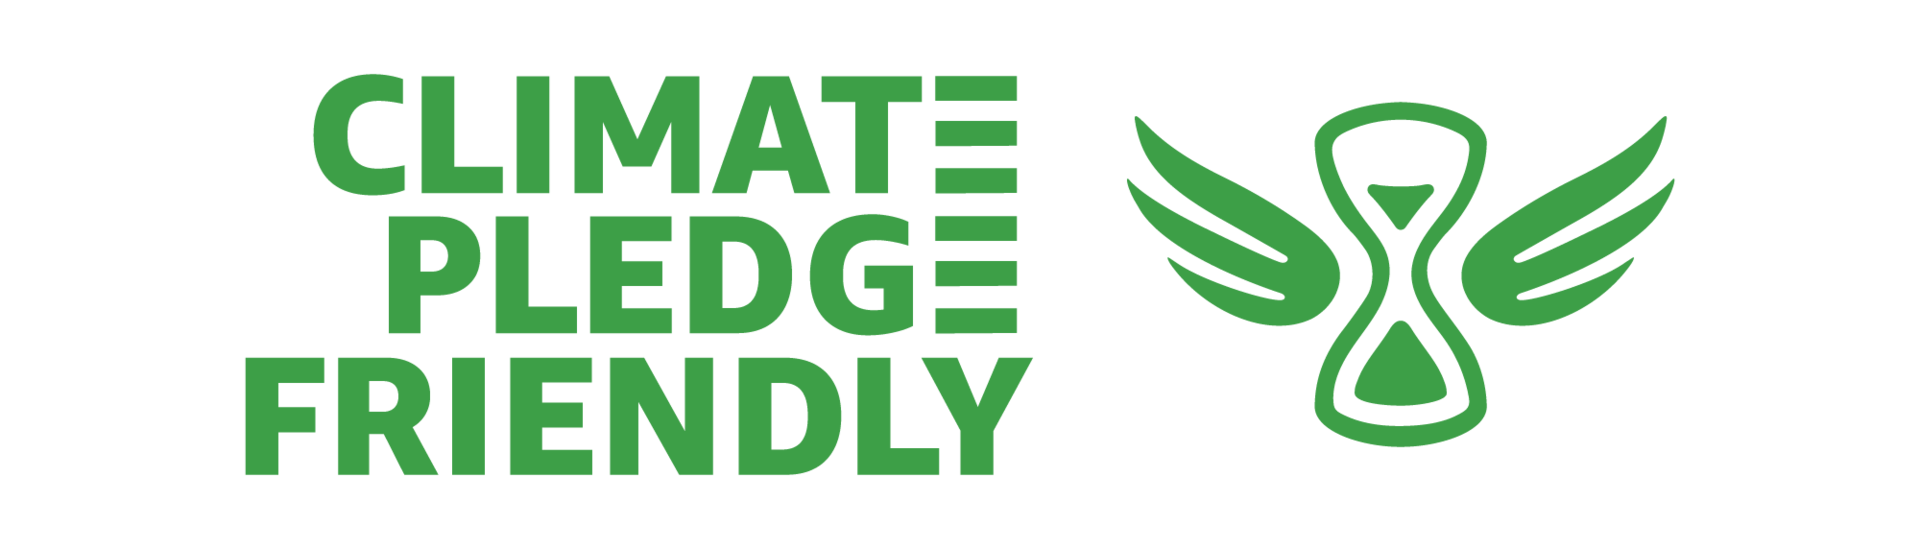 Amazon's Climate Pledge Friendly badge